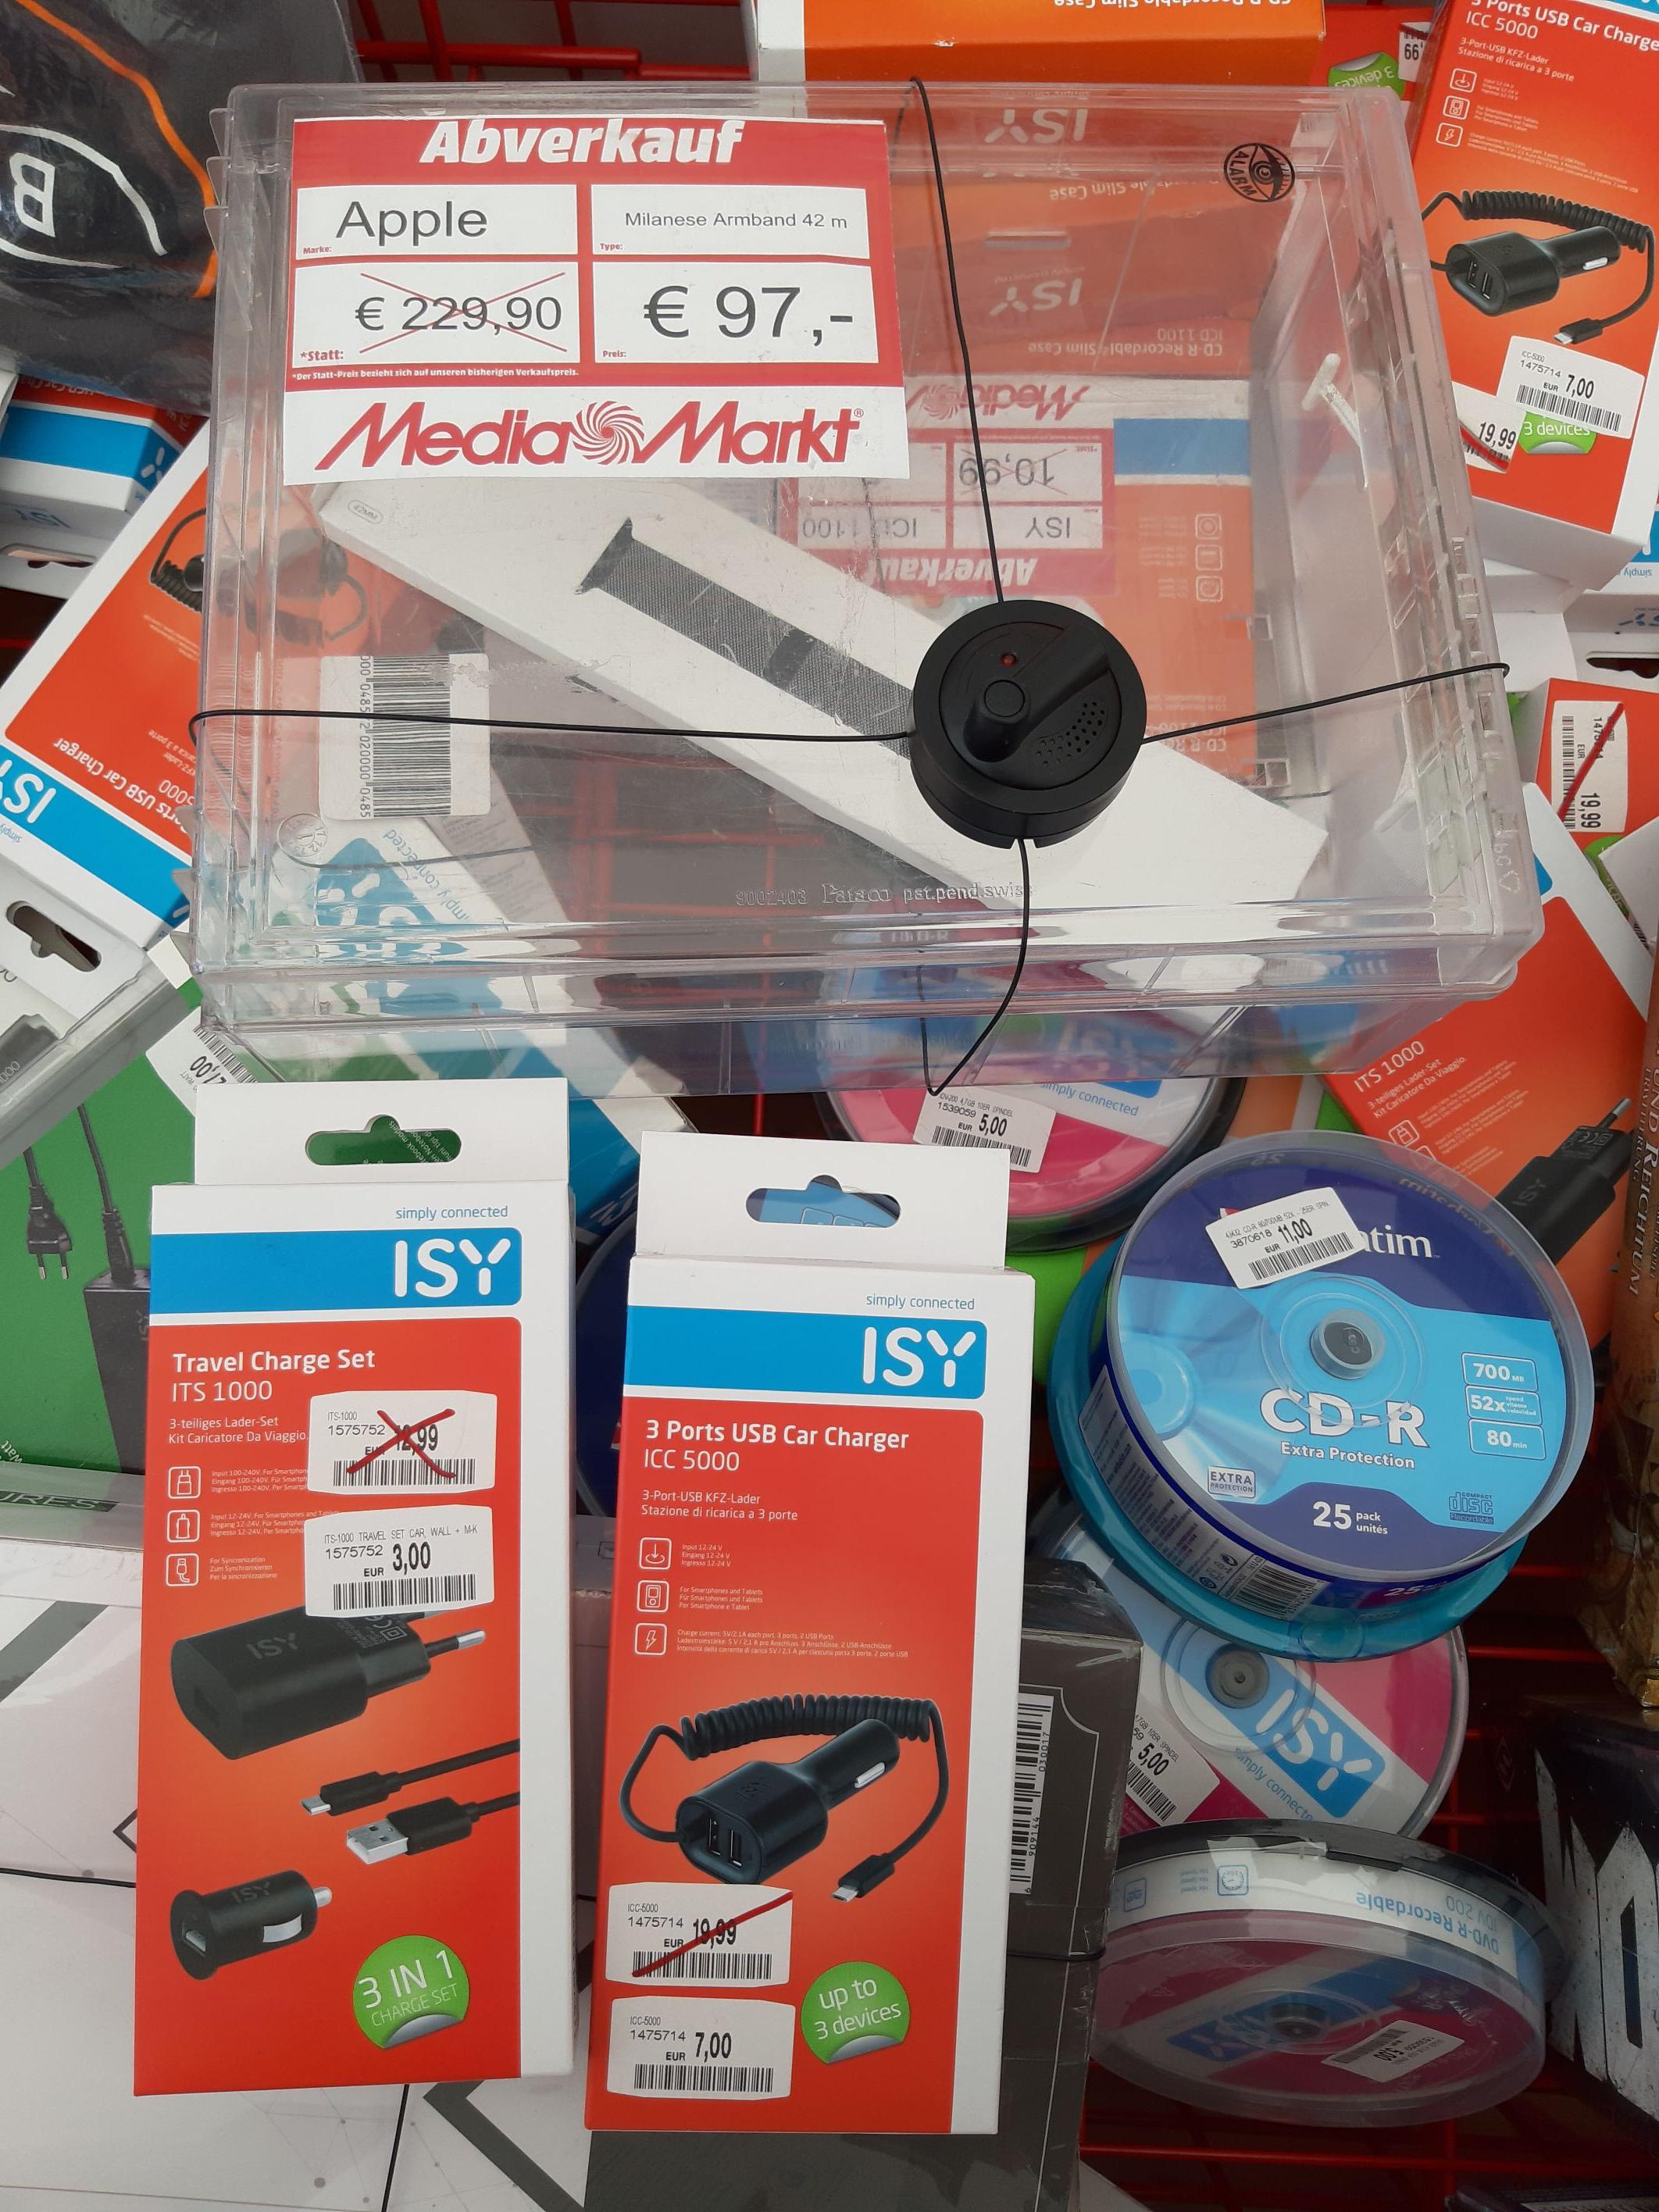 (Lokalangebot) Abverkauf bei Media Markt 21, Brünnerstrasse 57a, im Abverkaufszelt